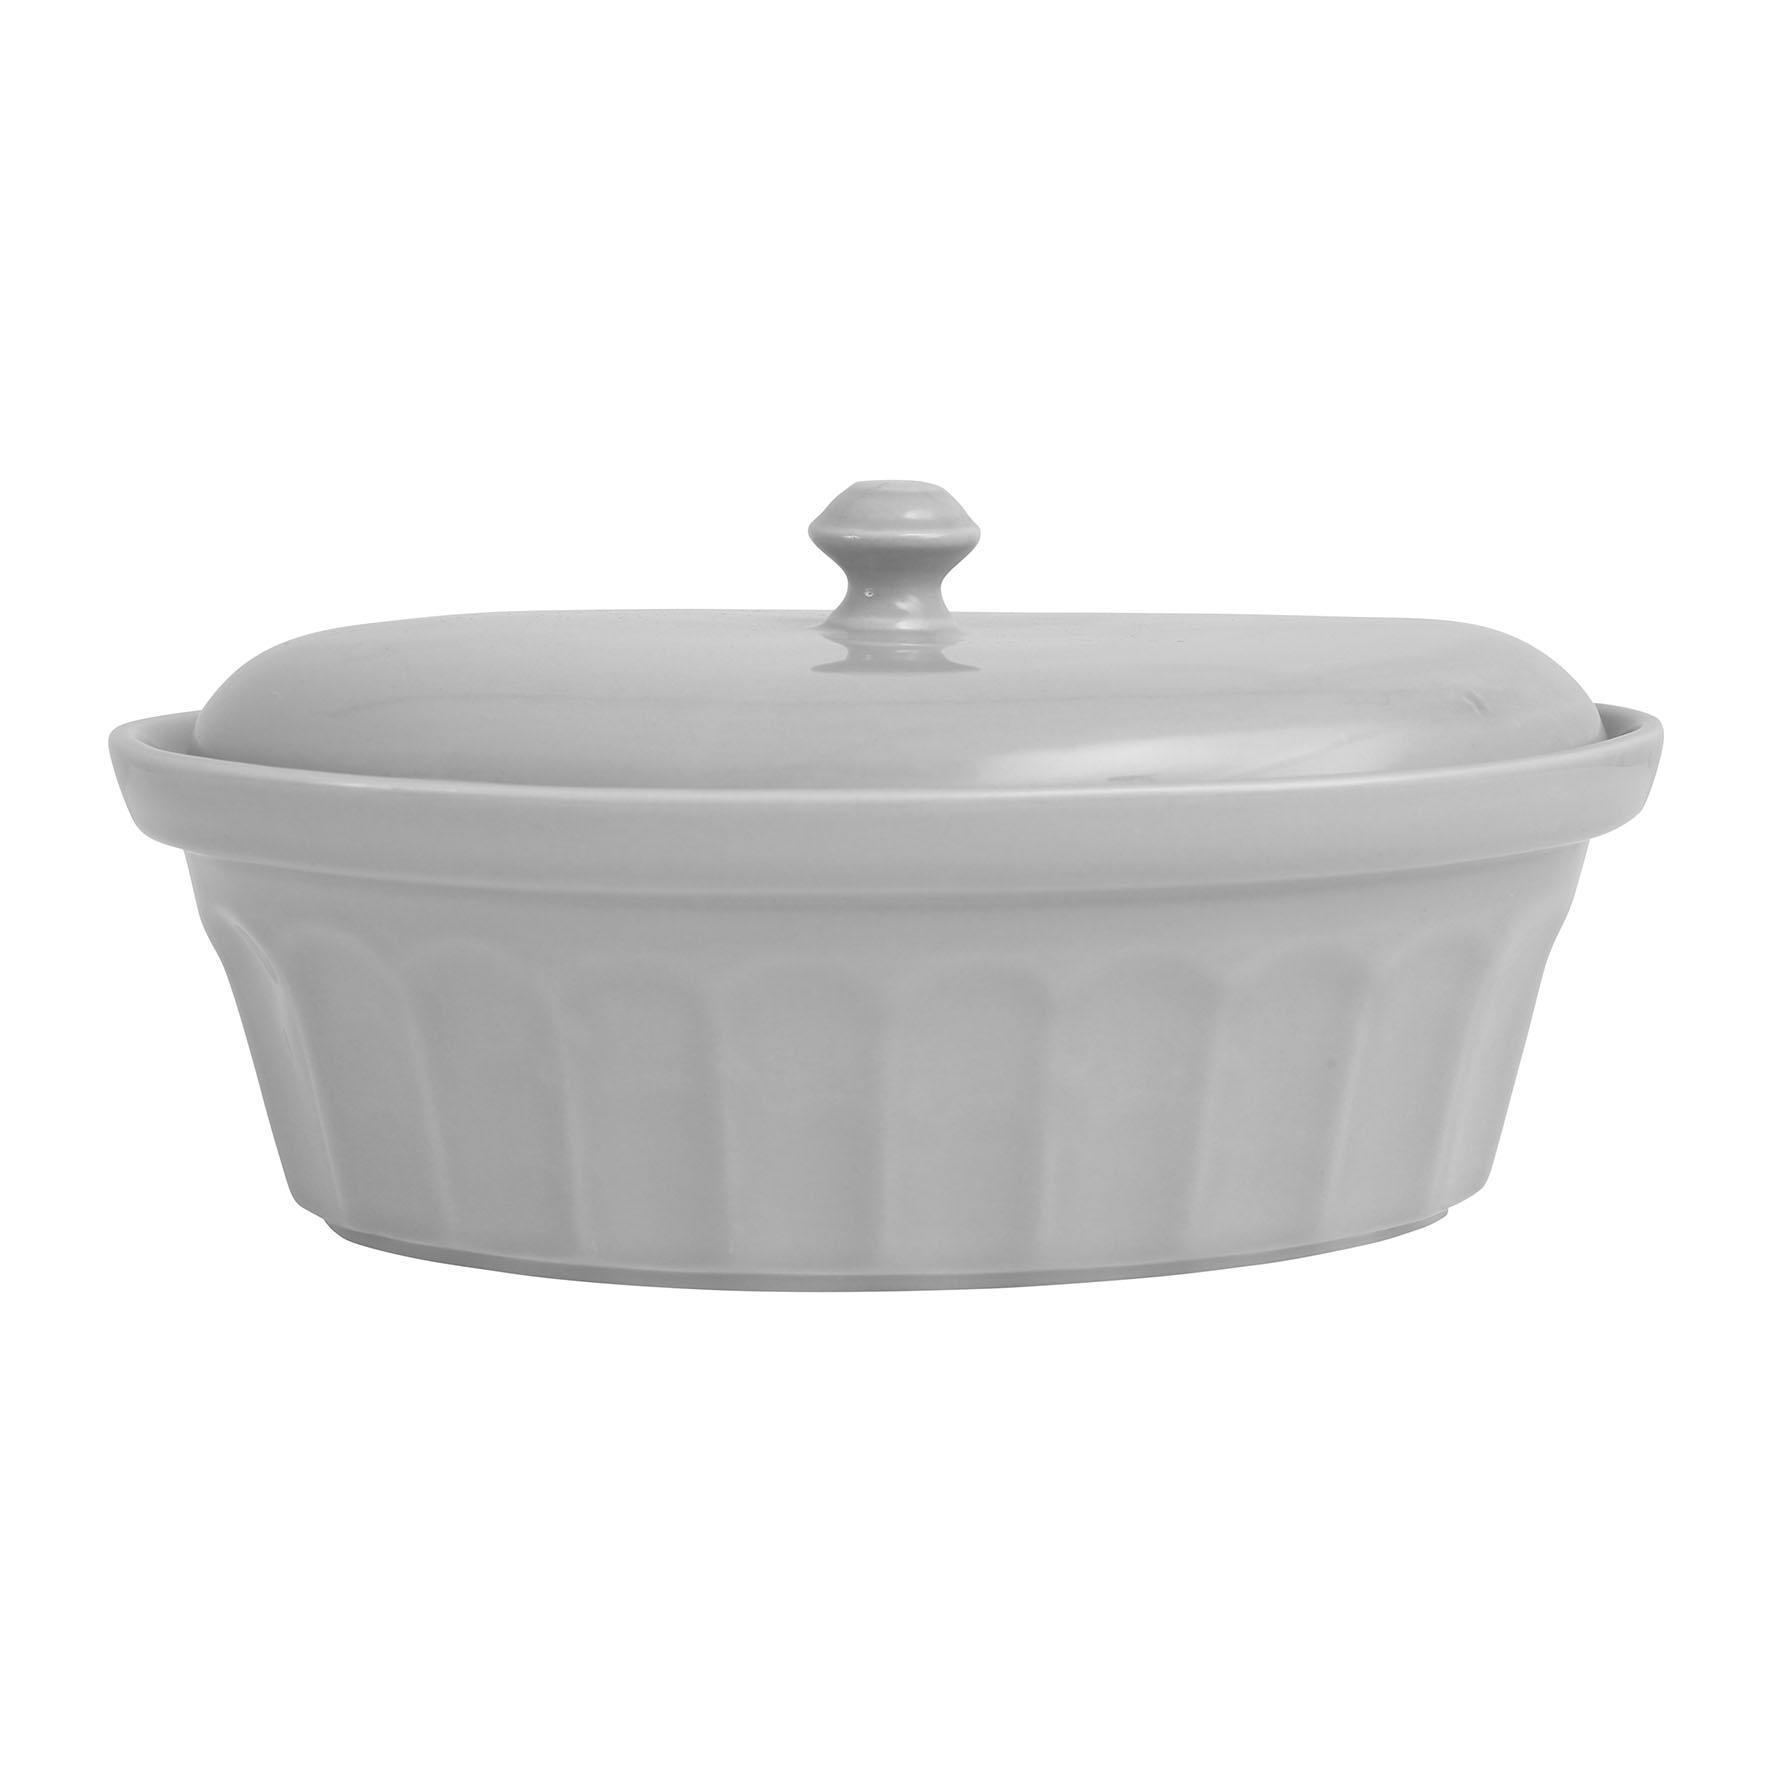 Côté Table Keramická zapékací mísa s víkem Gris, šedá barva, keramika